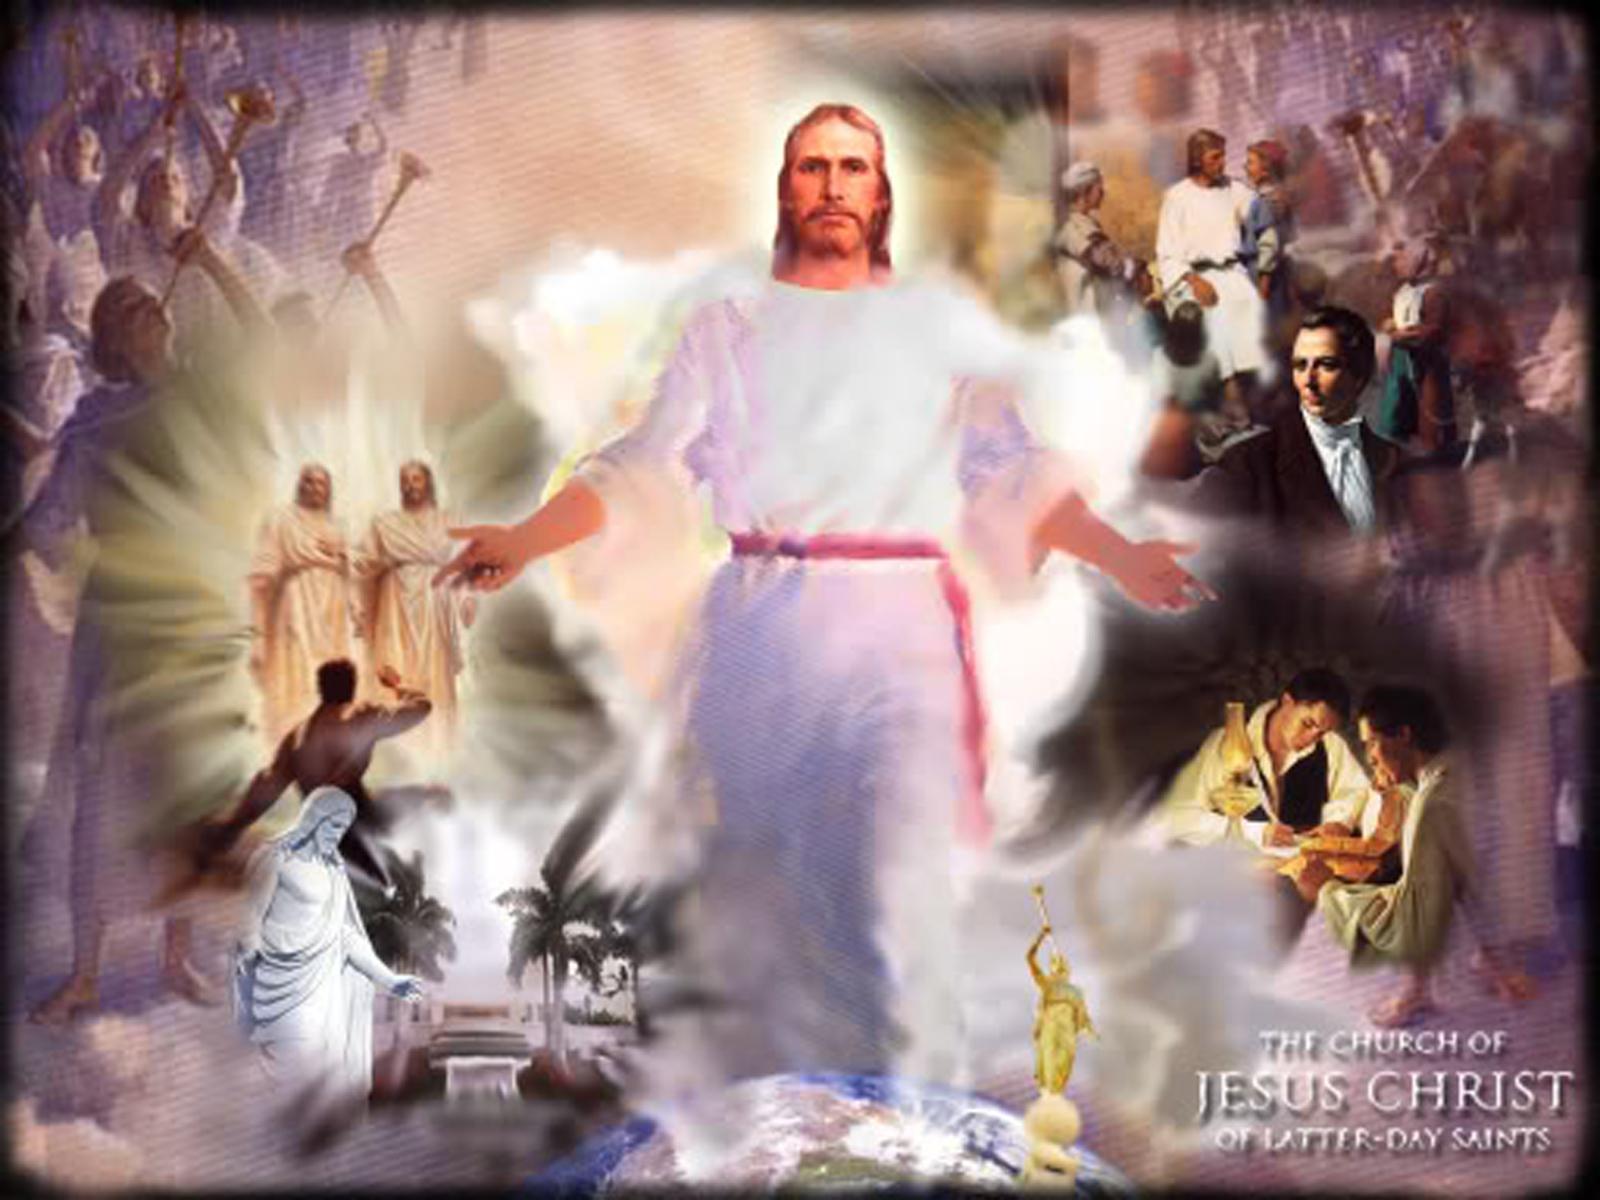 http://4.bp.blogspot.com/-Whb6sxeglpY/TbT32T_v2LI/AAAAAAAAACo/wcN2oKUOfYM/s1600/Latter-Day-Saints-mormonism-7866433-1600-1200.jpg